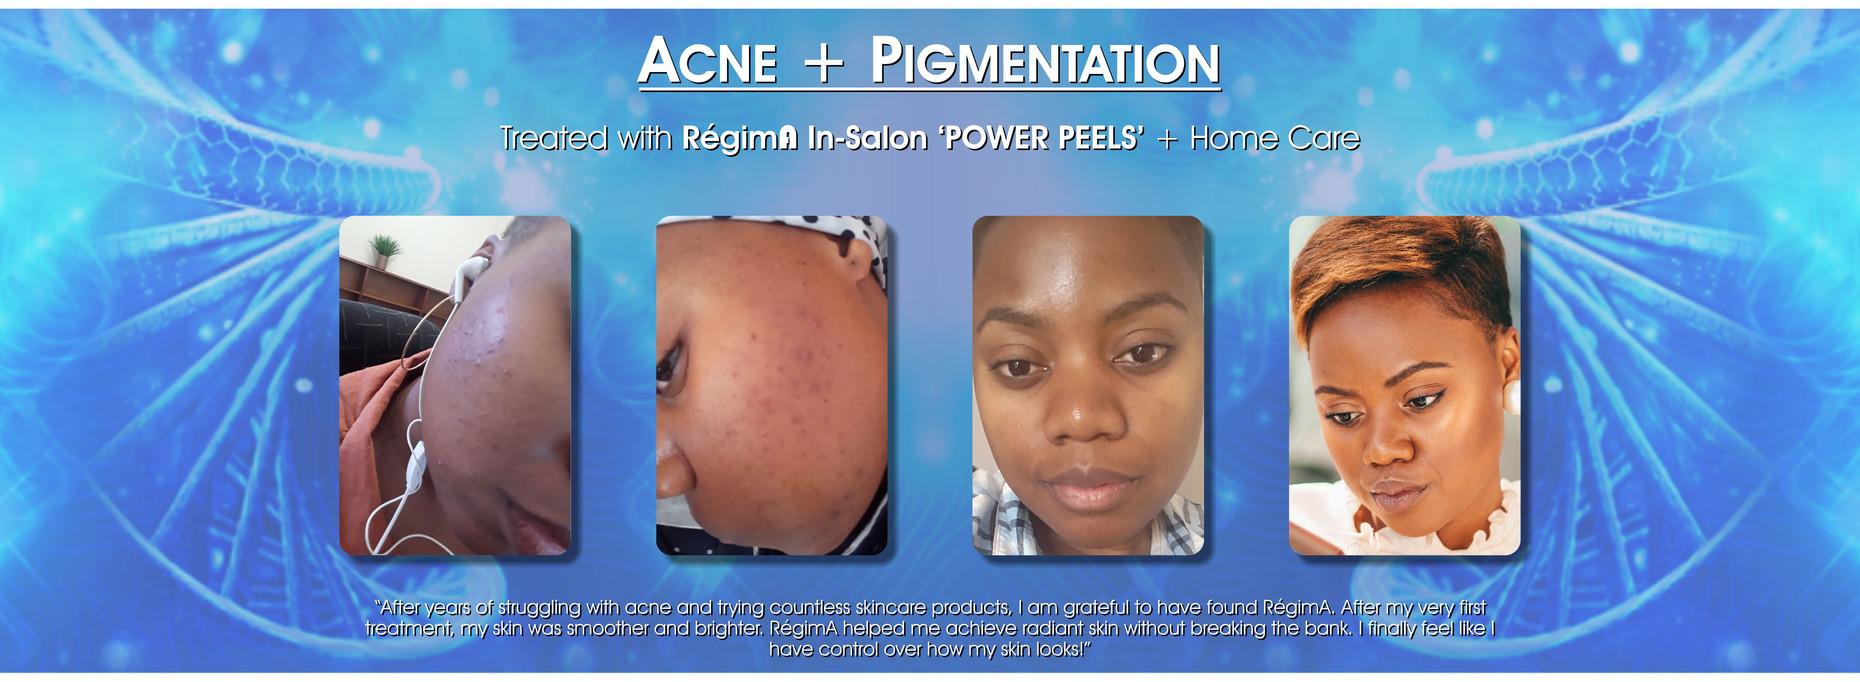 Acne + Pigmentation Treatment